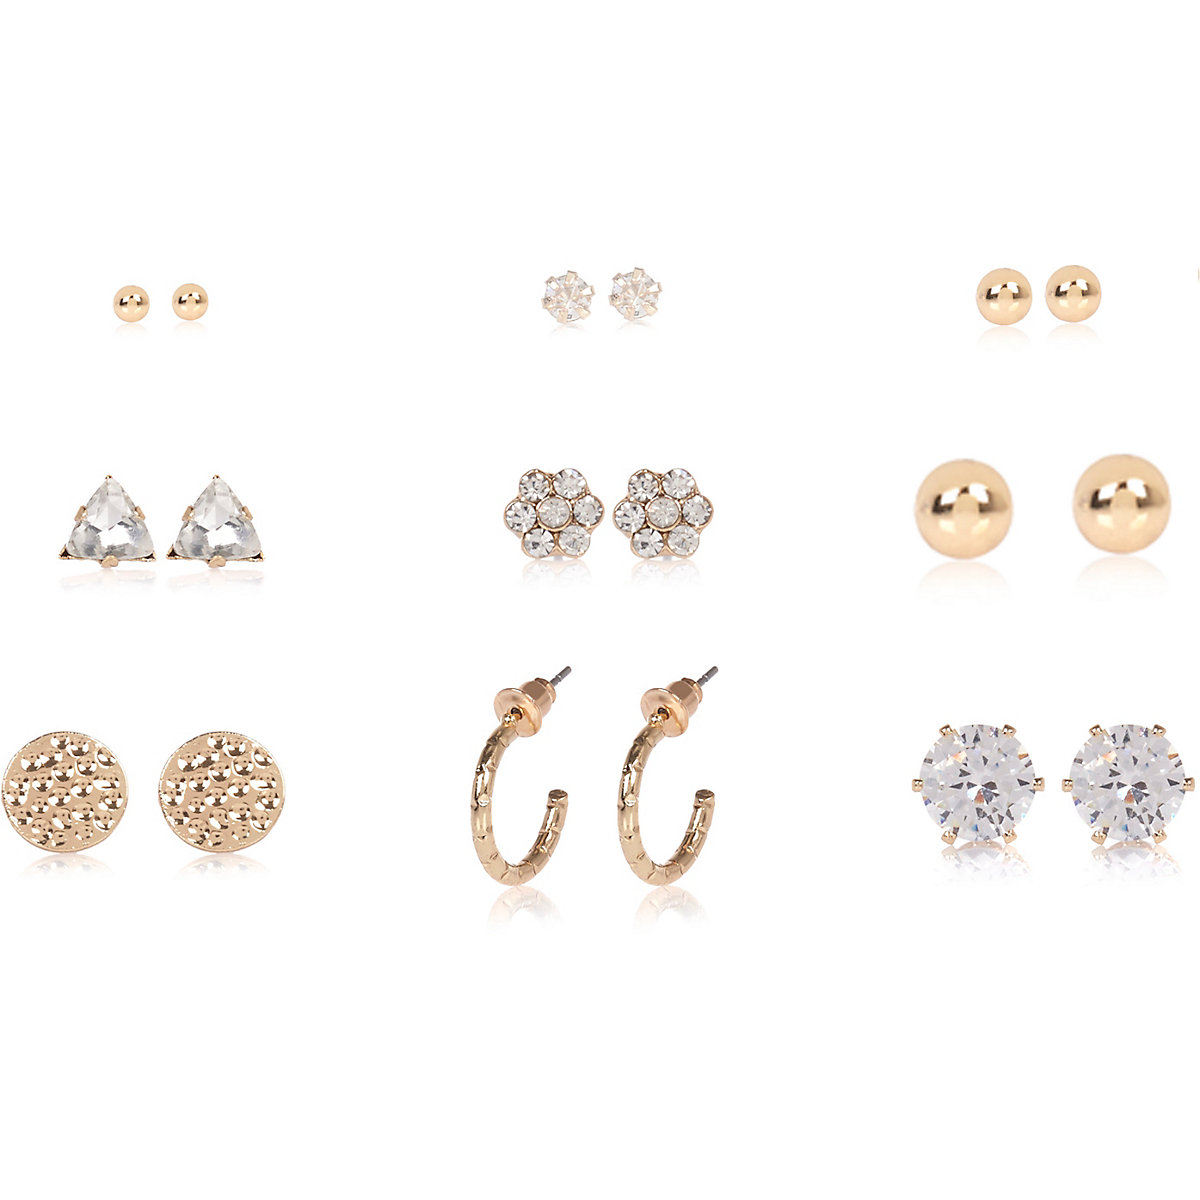 Gold tone diamante stud earrings pack